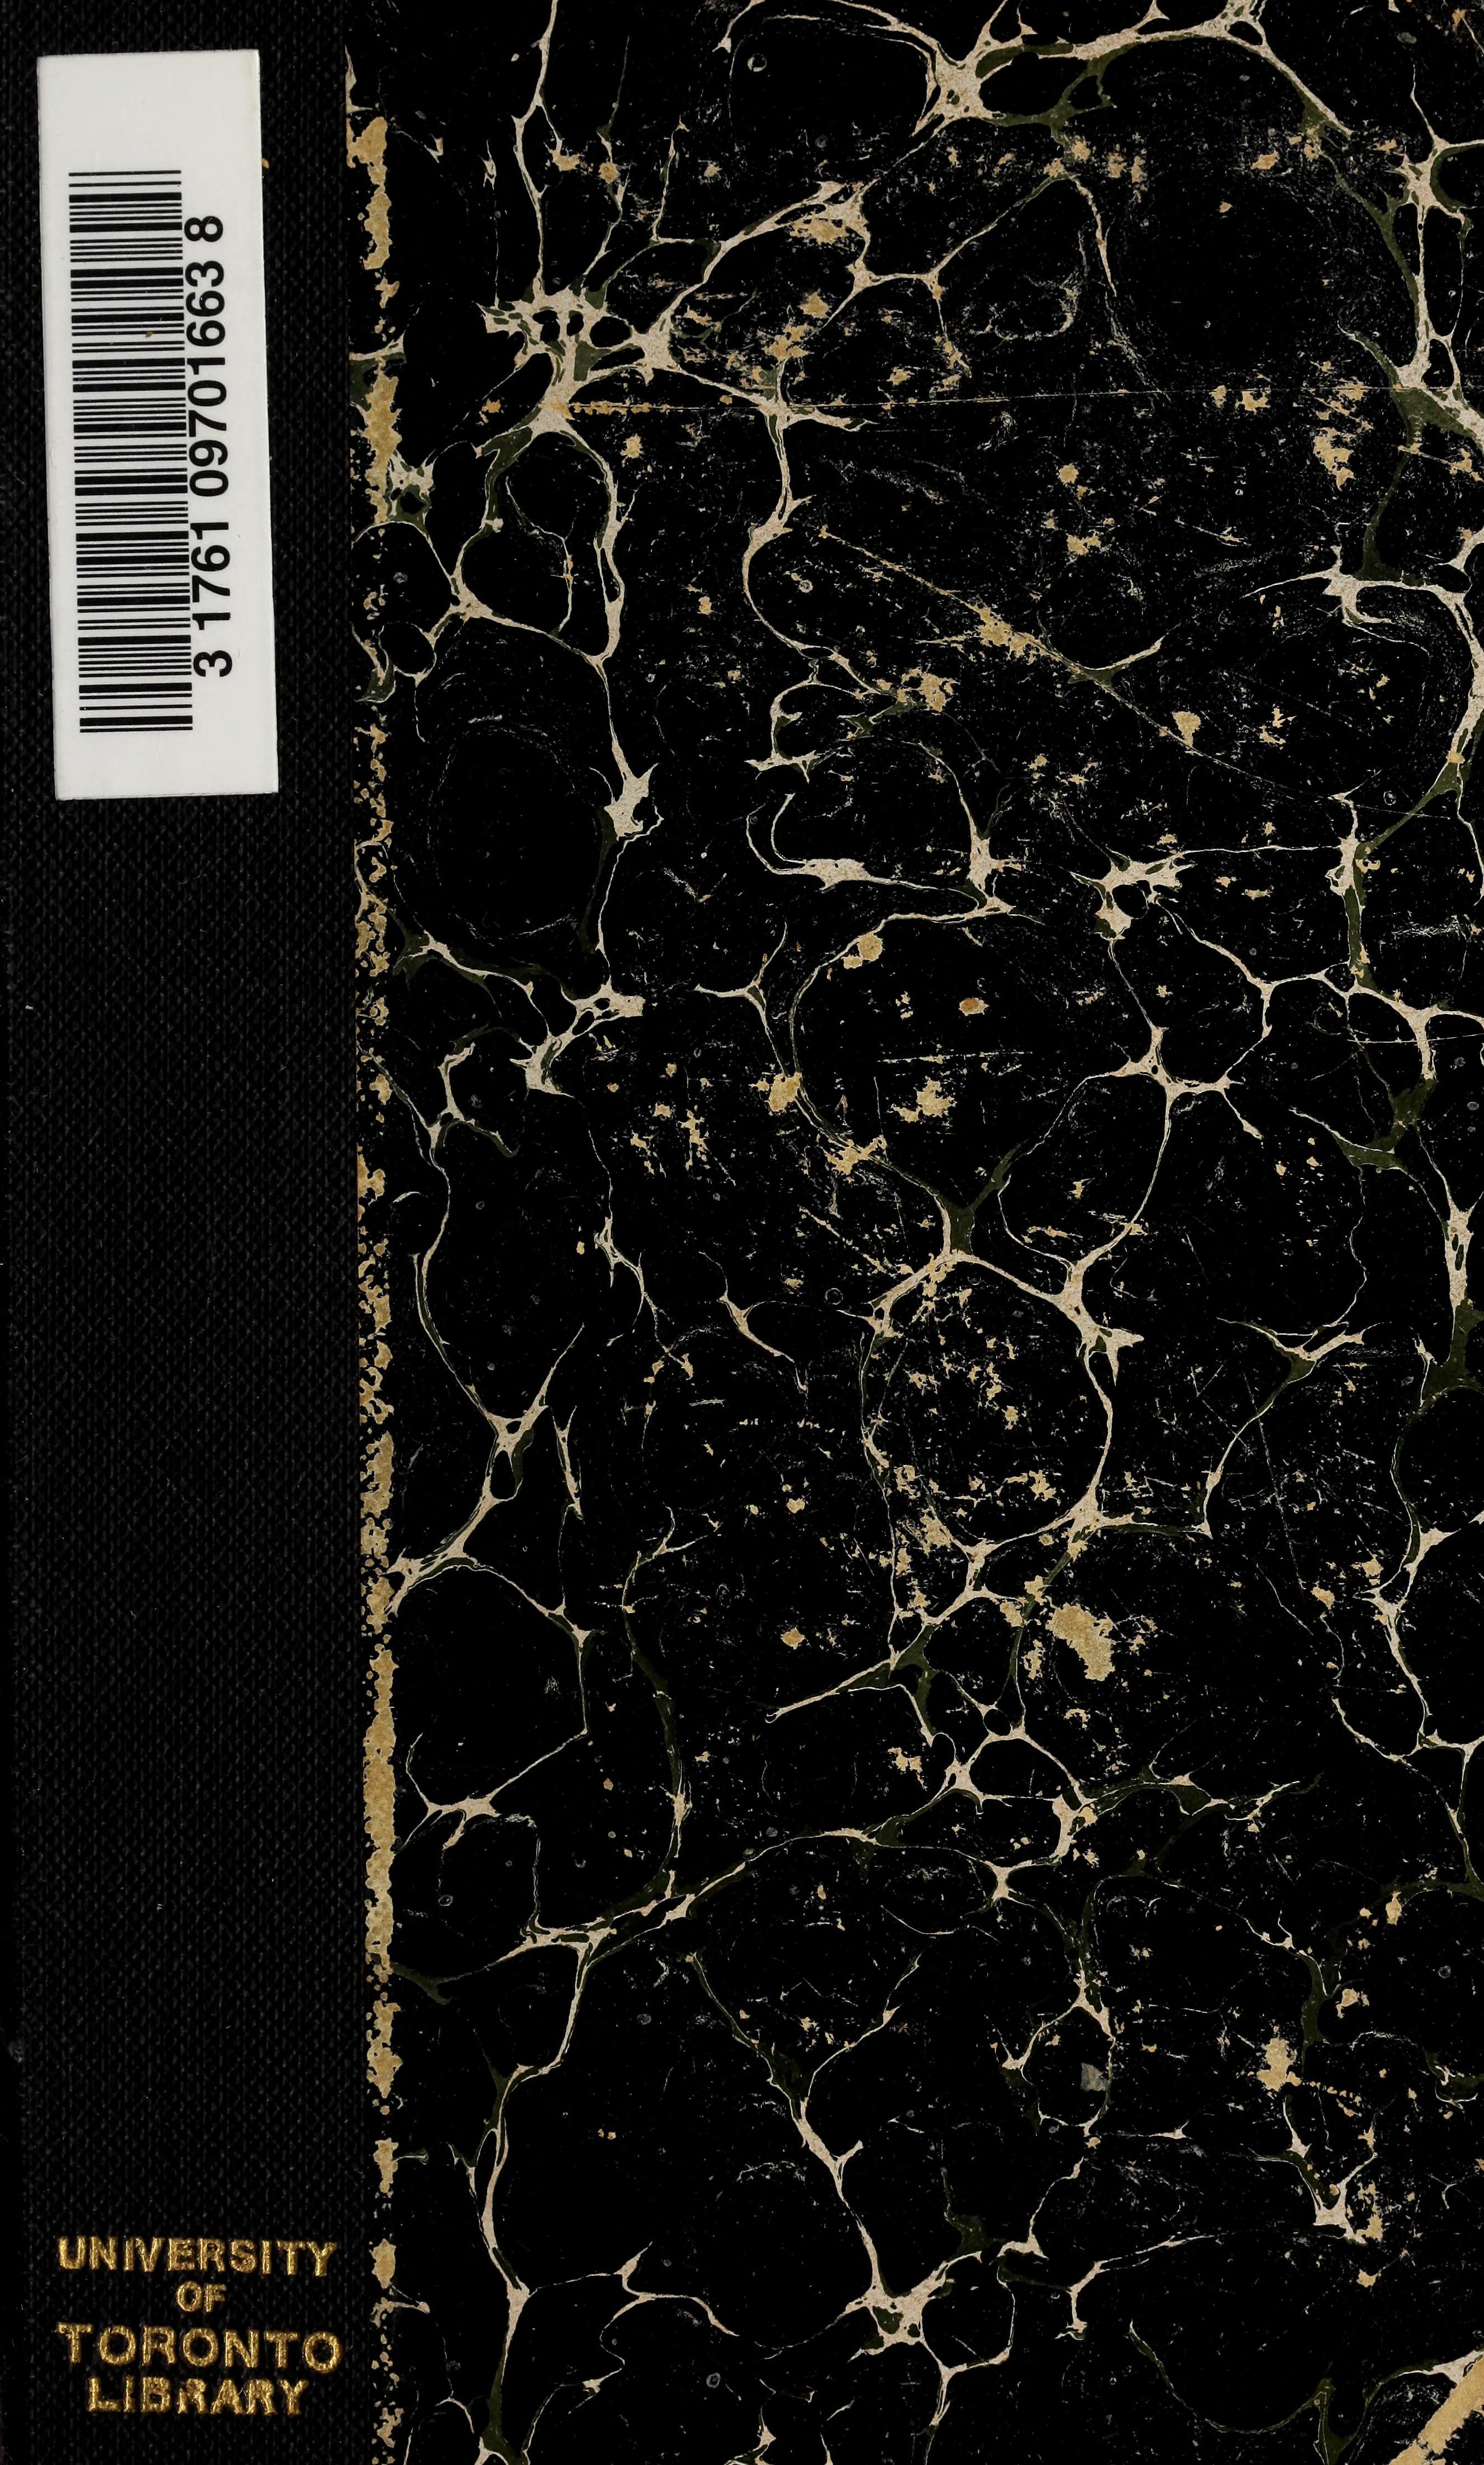 friedrichnietzsc00khle&server=ia600503.us.archive.org&page=preview&